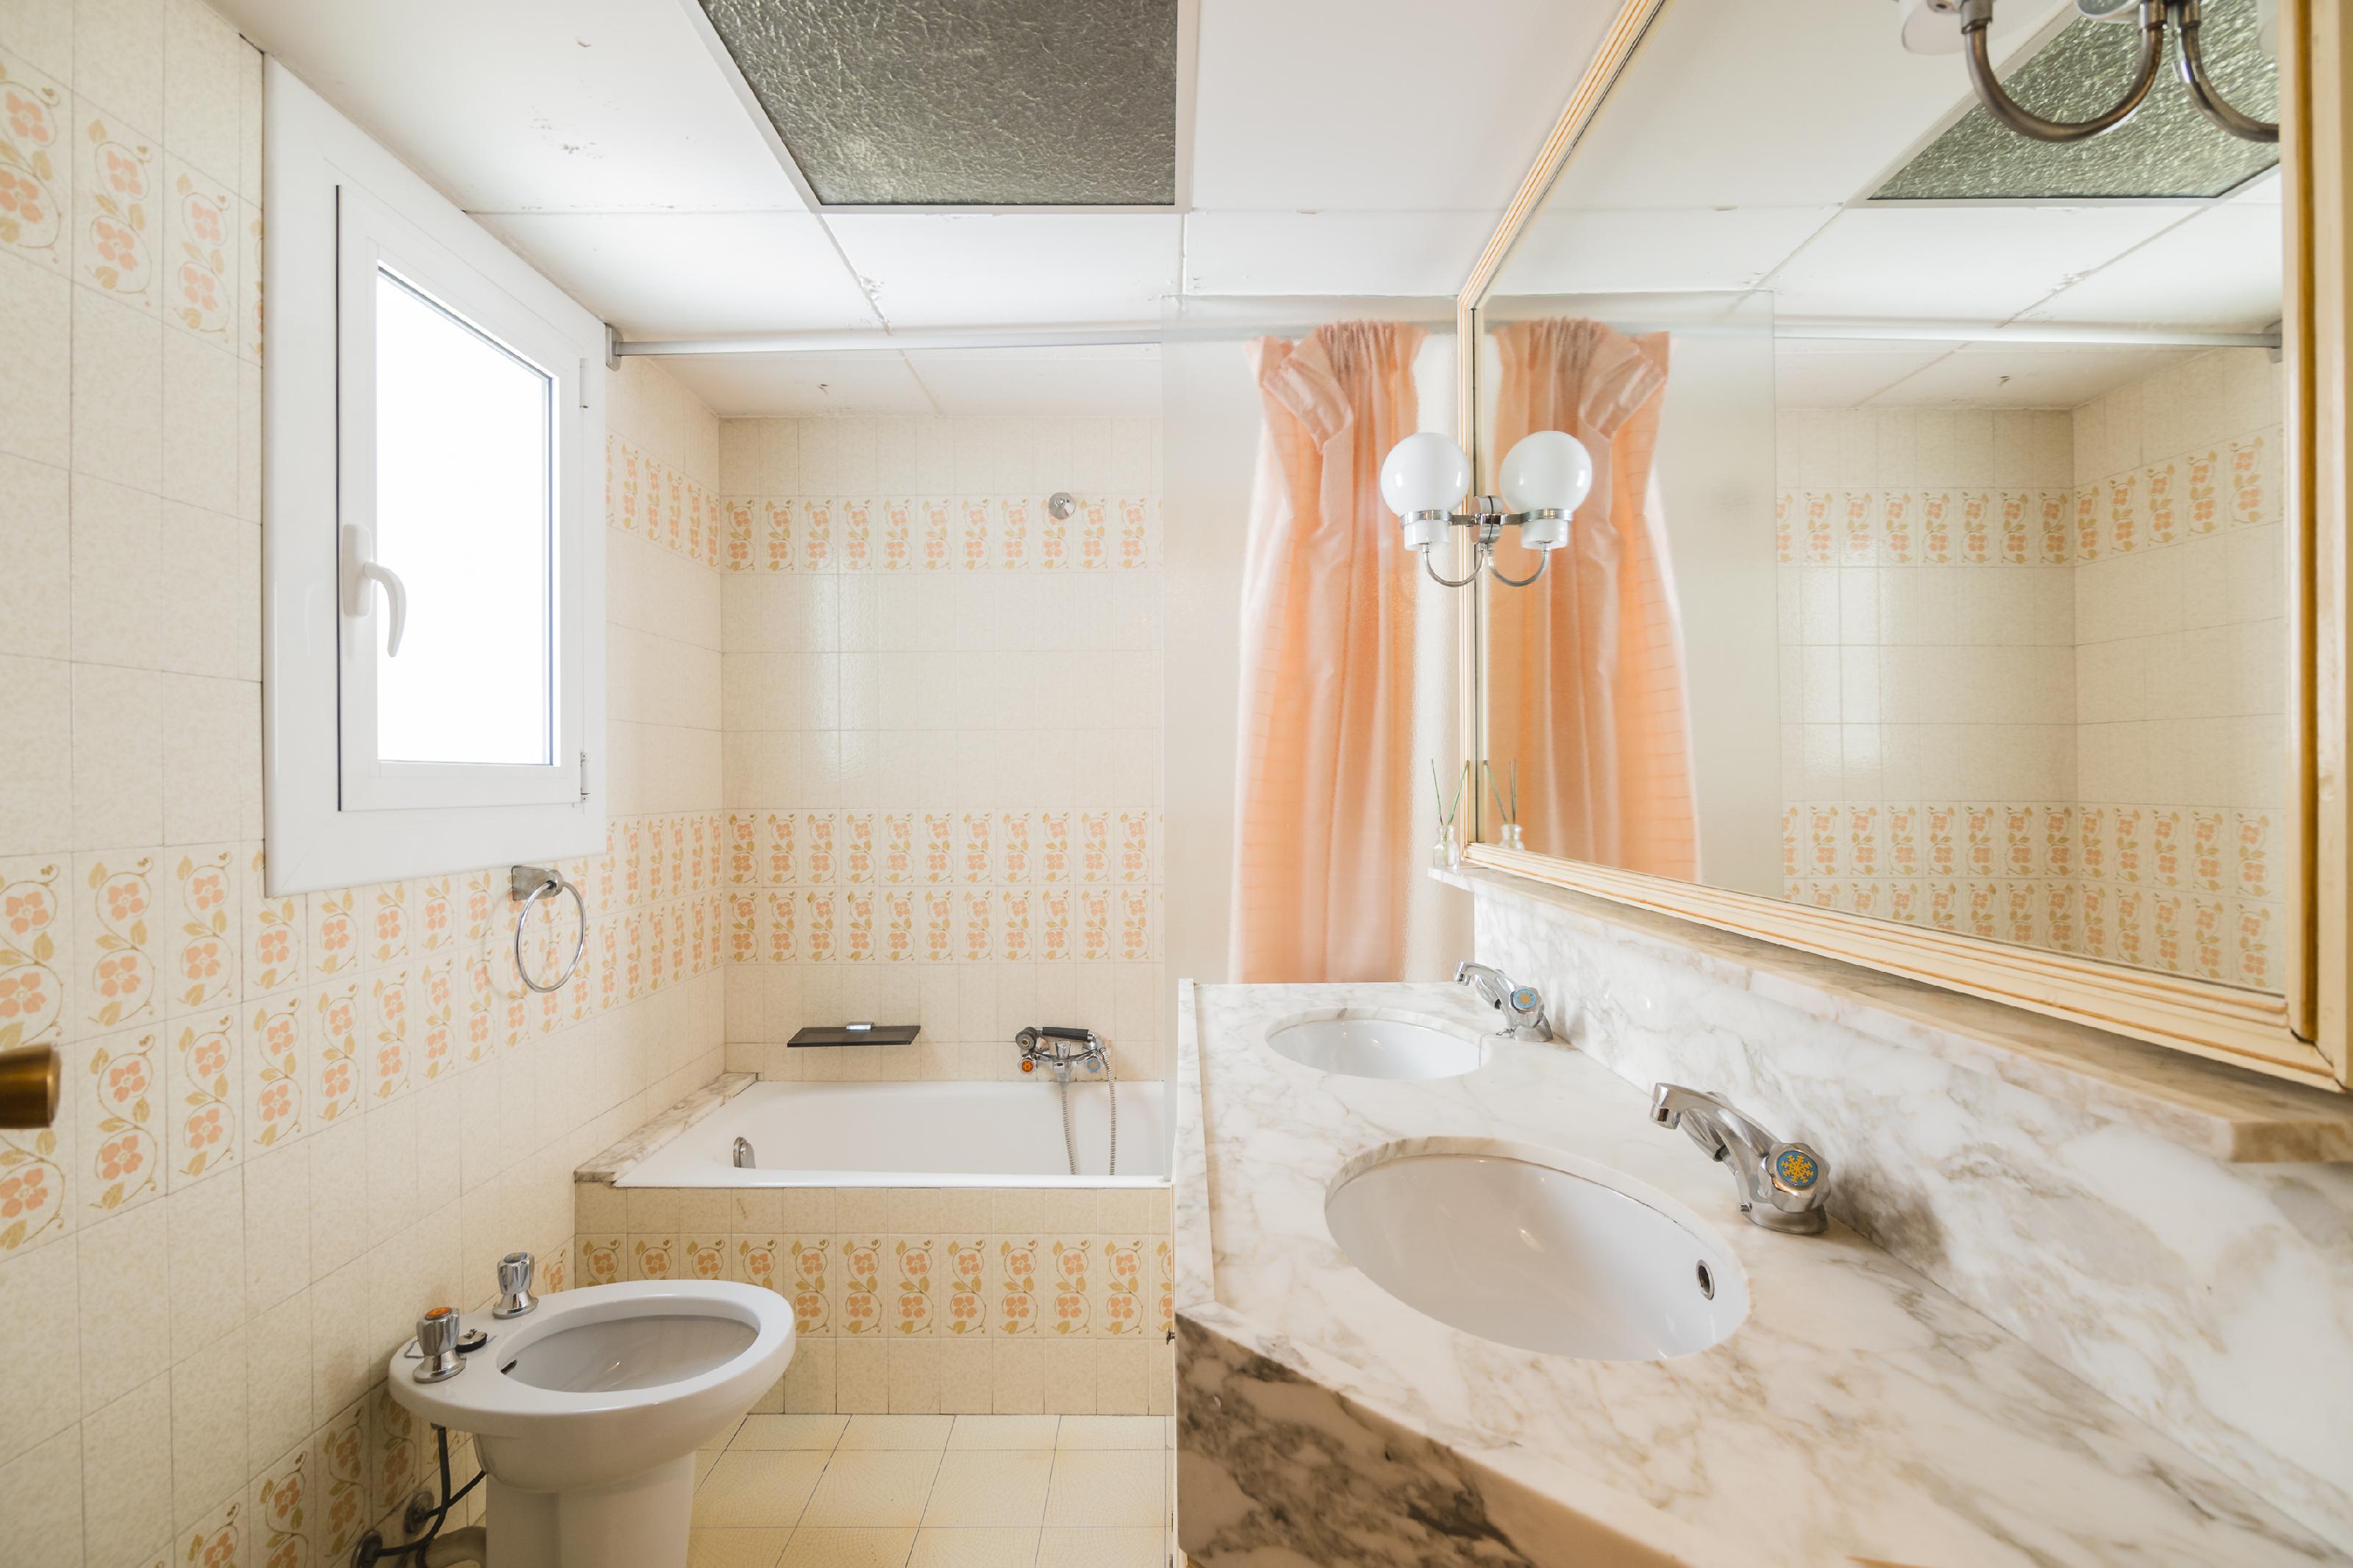 249856 Flat for sale in Sarrià-Sant Gervasi, Sant Gervasi-Galvany 26